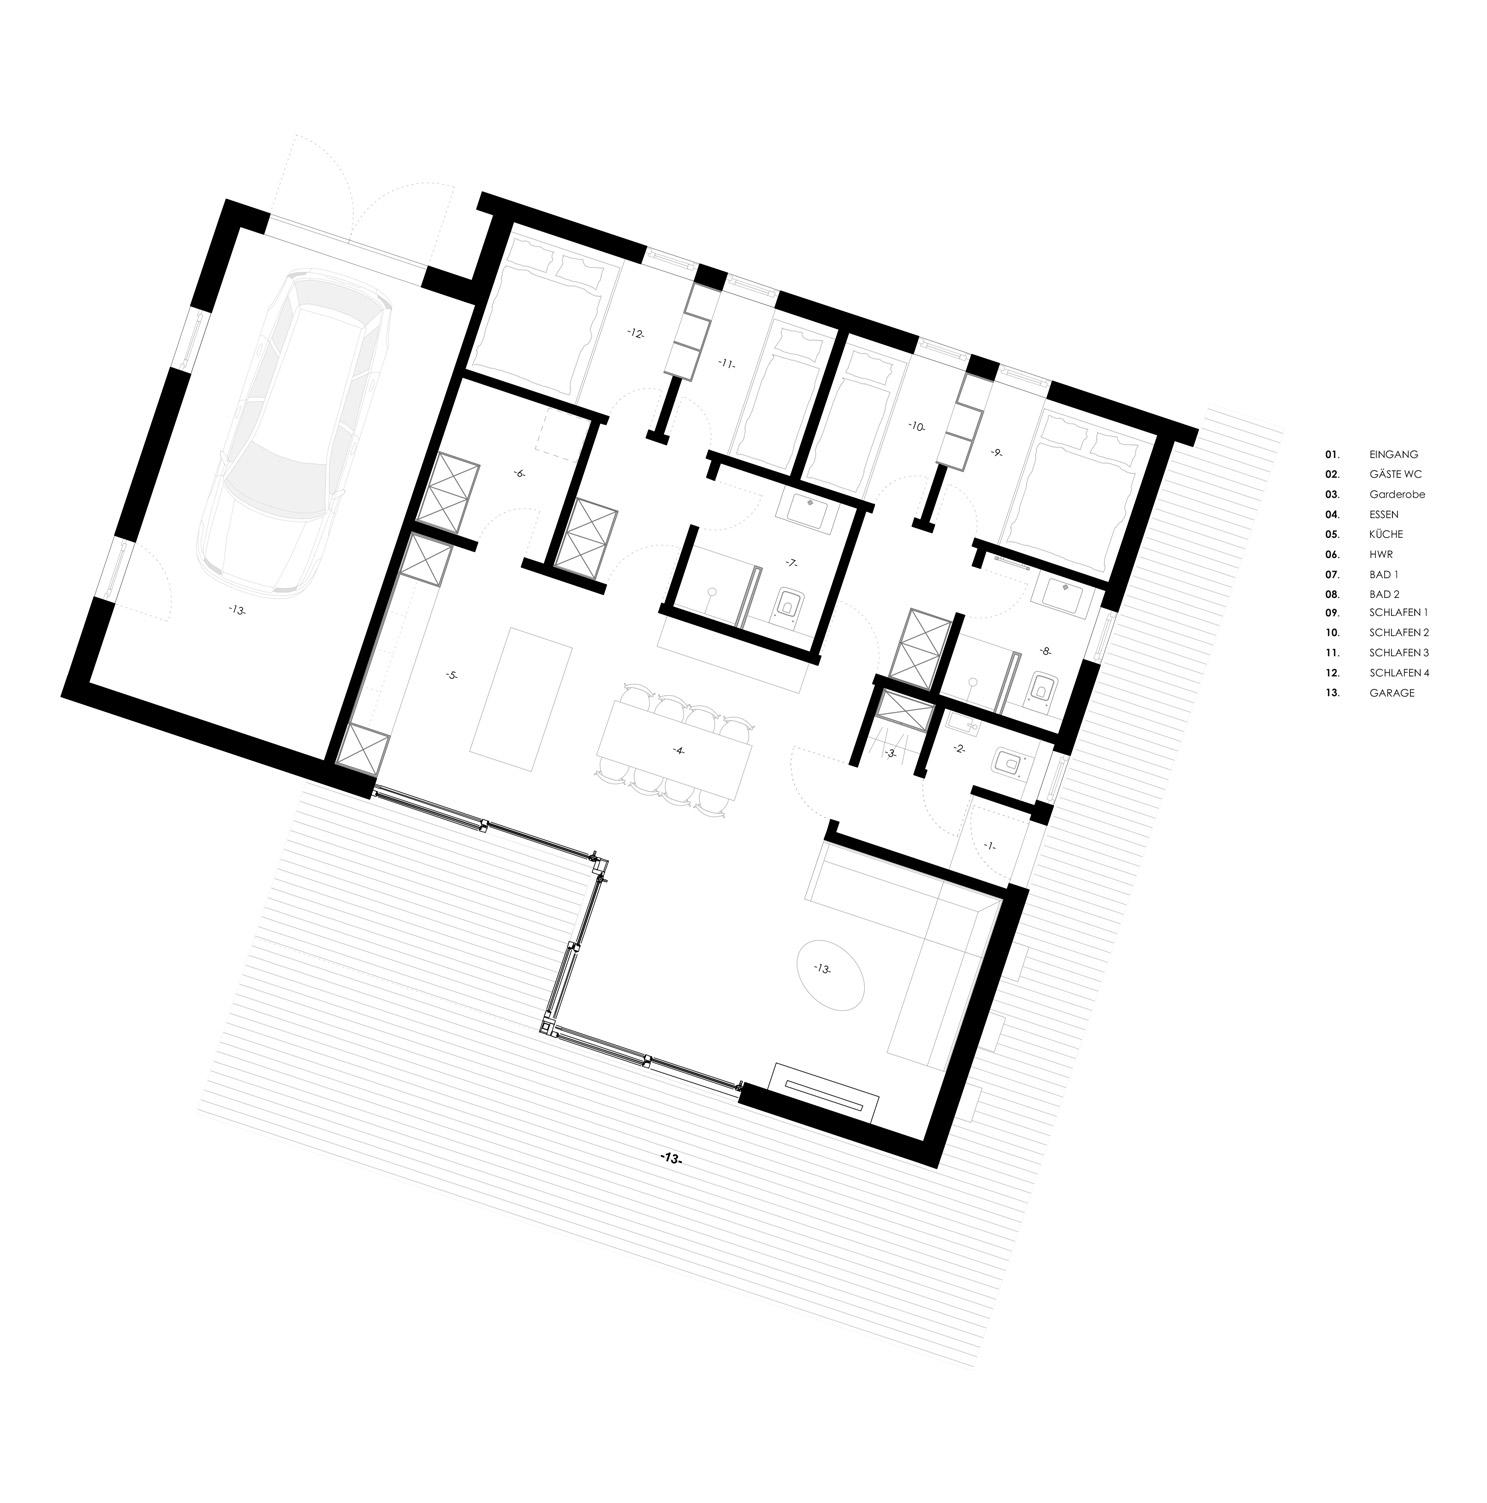 10-13_Haus Jeep_Grundriss